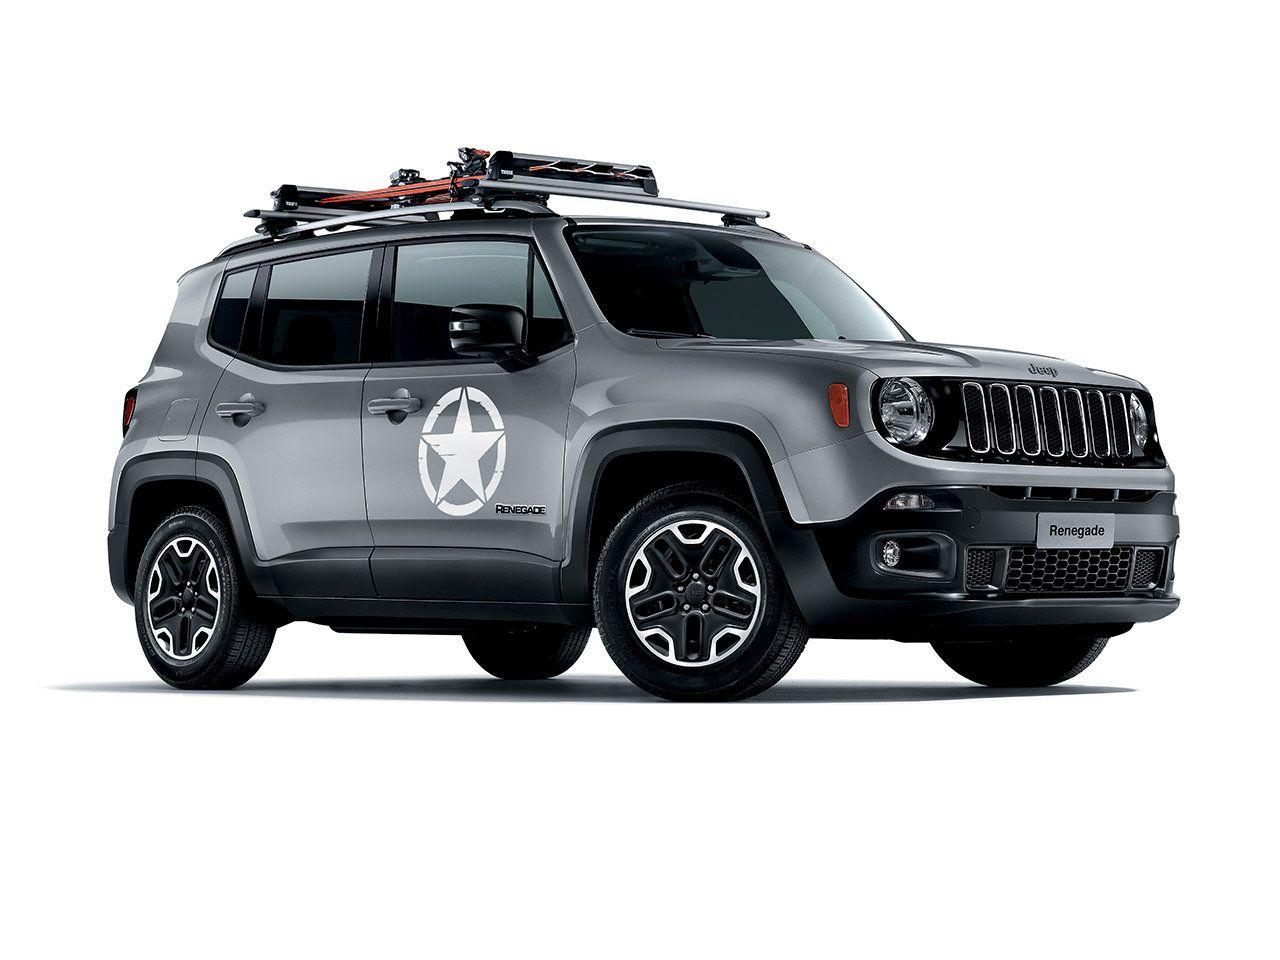 Http Www Omniauto It Awpimages Photogallery 2014 20031 Photos1280 Jeep Renegade Con Accessori Mopar 16 Jpg Jeep Renegade 2015 Jeep Renegade Mini Jeep